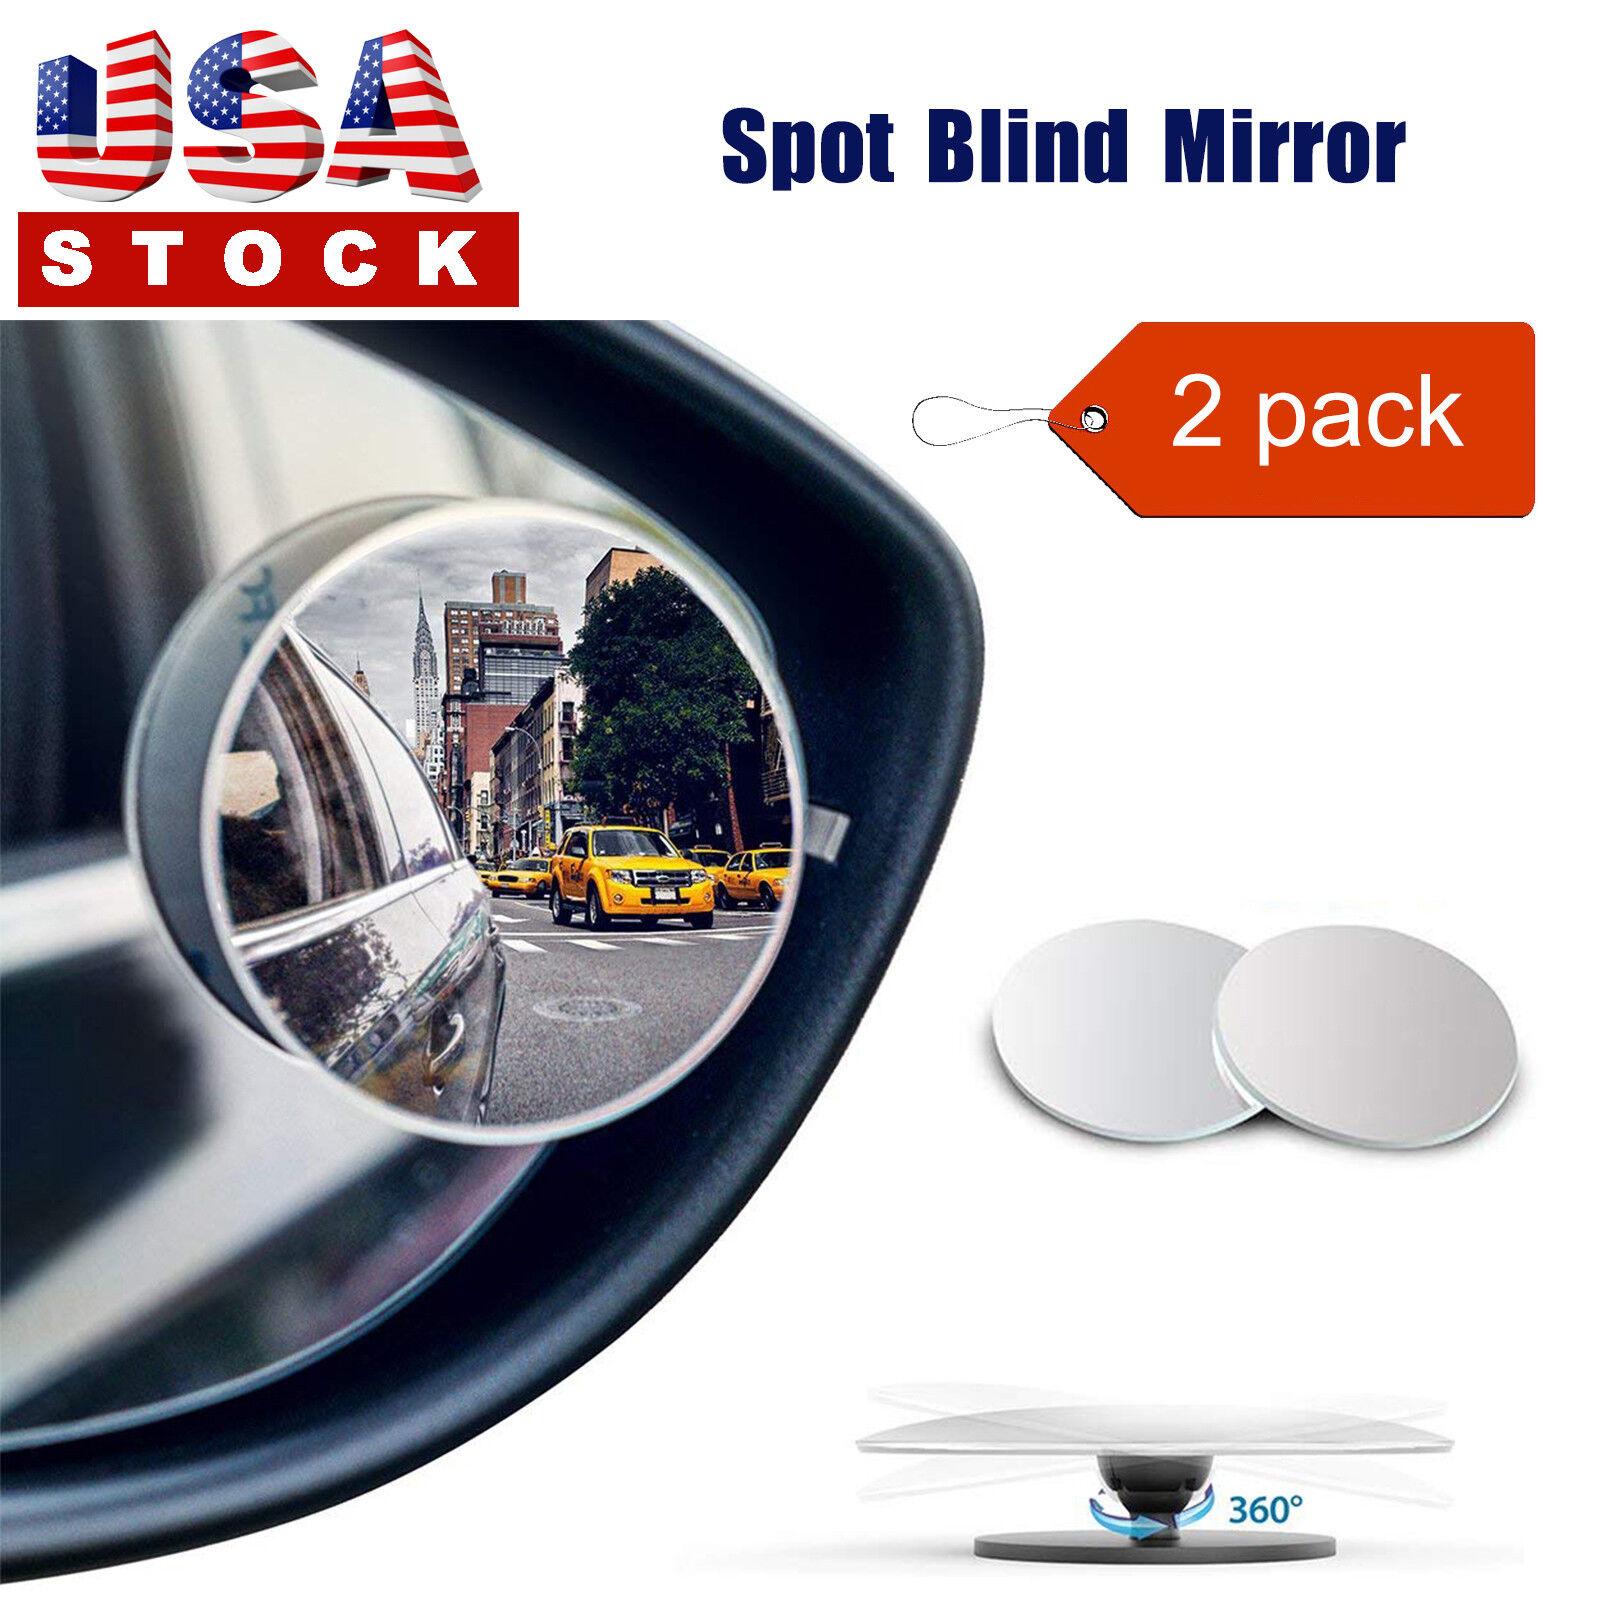 360° Adjustable Blind Spot Mirror Car Trunk Spot side Mirror Mini 2 Pack